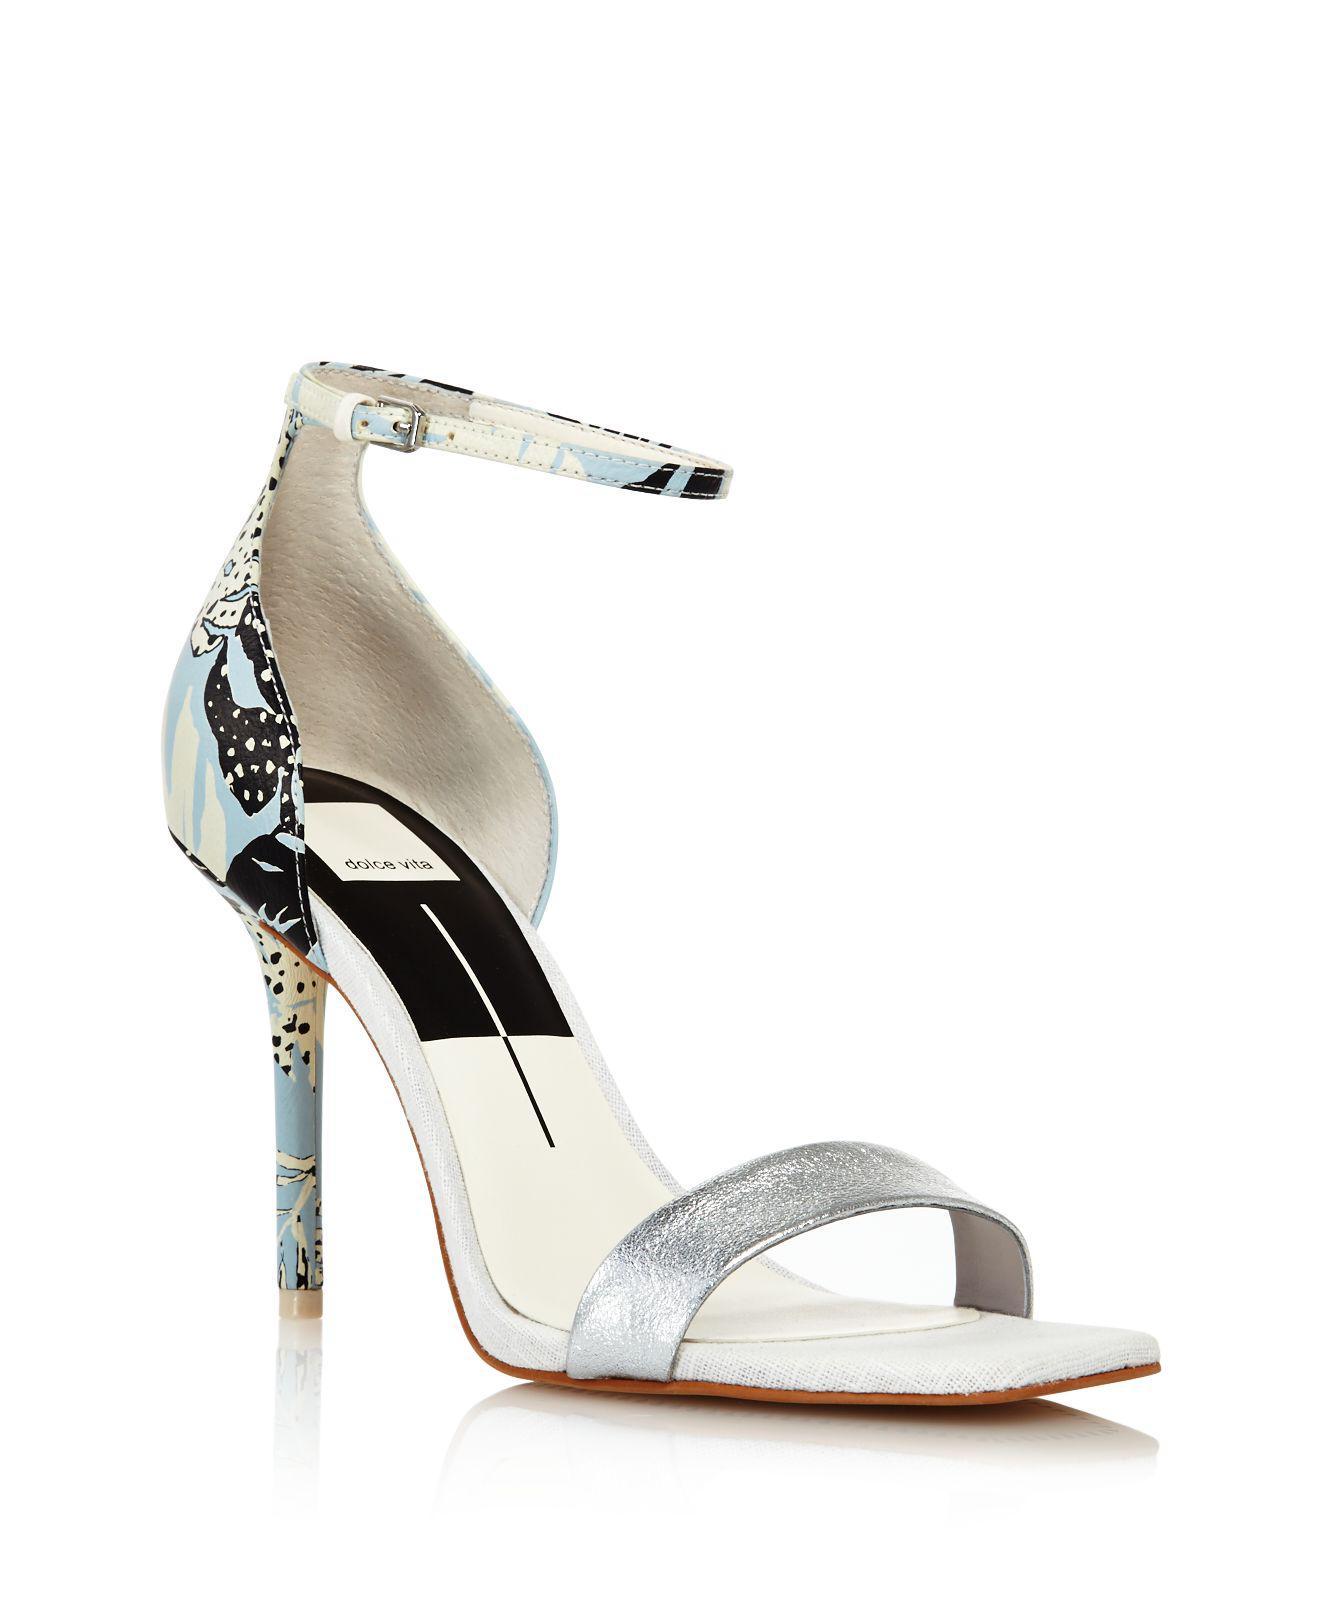 Dolce Vita Shoes Uk